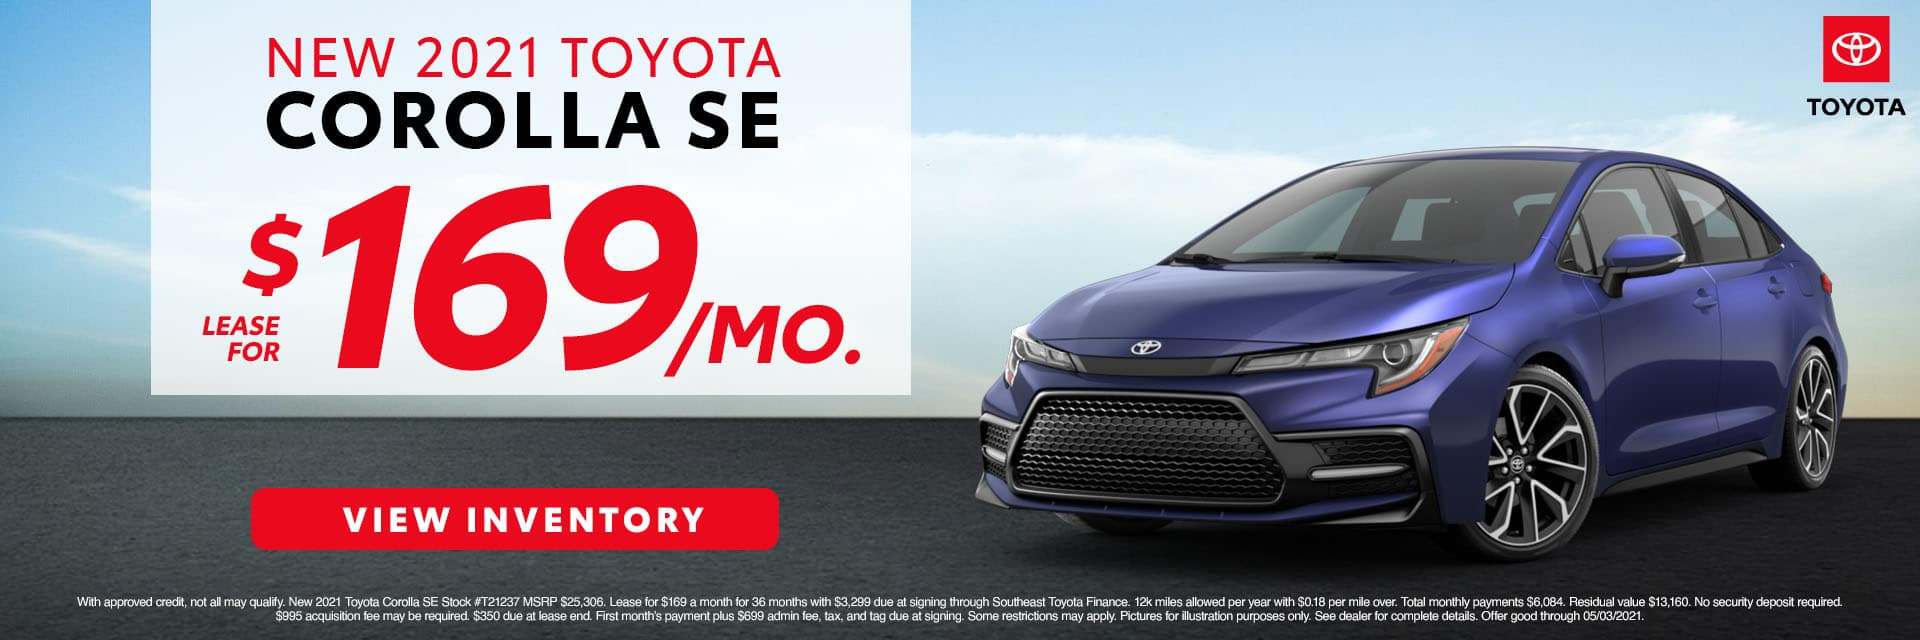 CLTW-April 2021-2021 Toyota Corolla